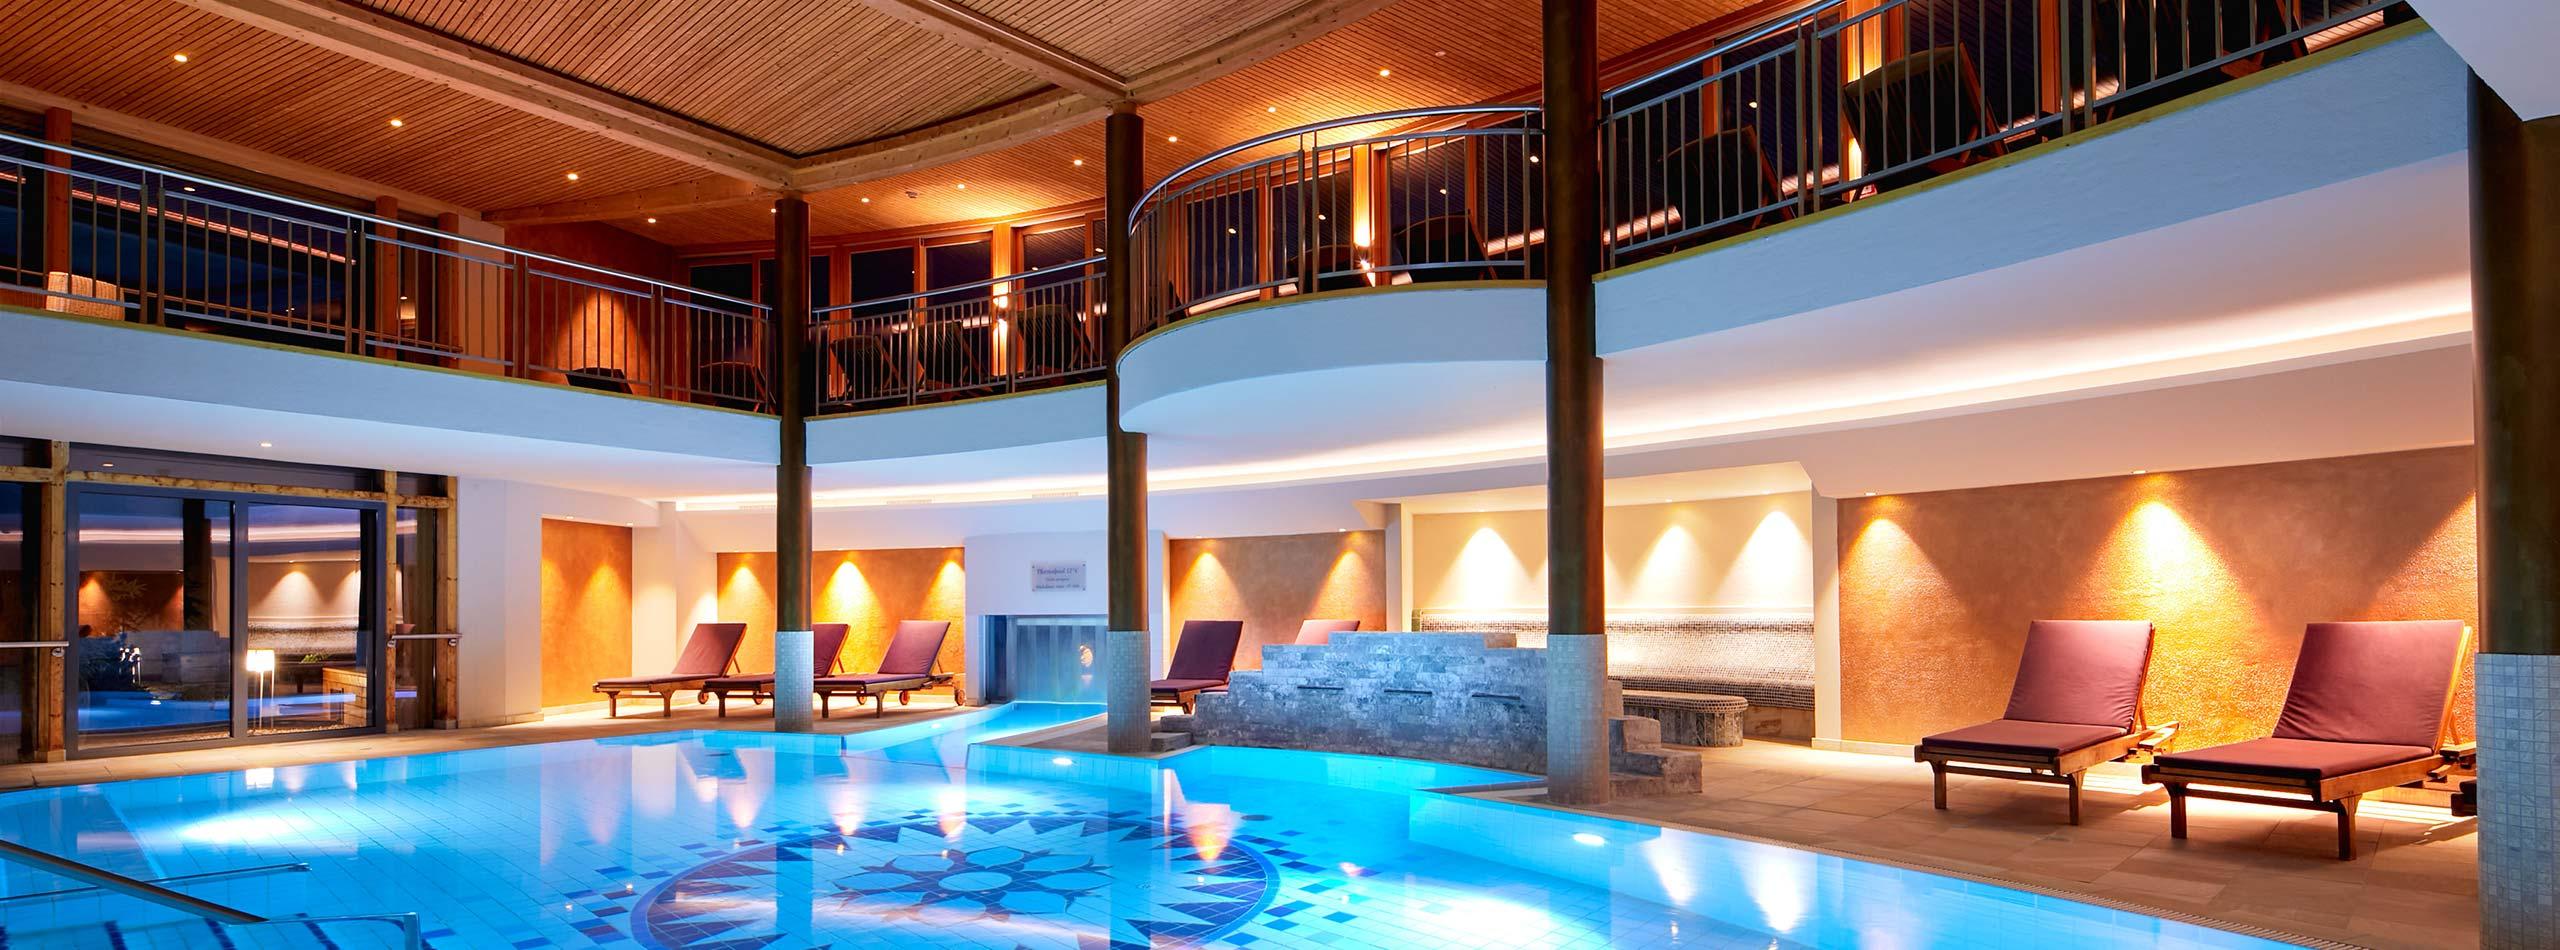 Thermal Spa im Ayurveda Resort Mandira Bad Waltersdorf Steiermark